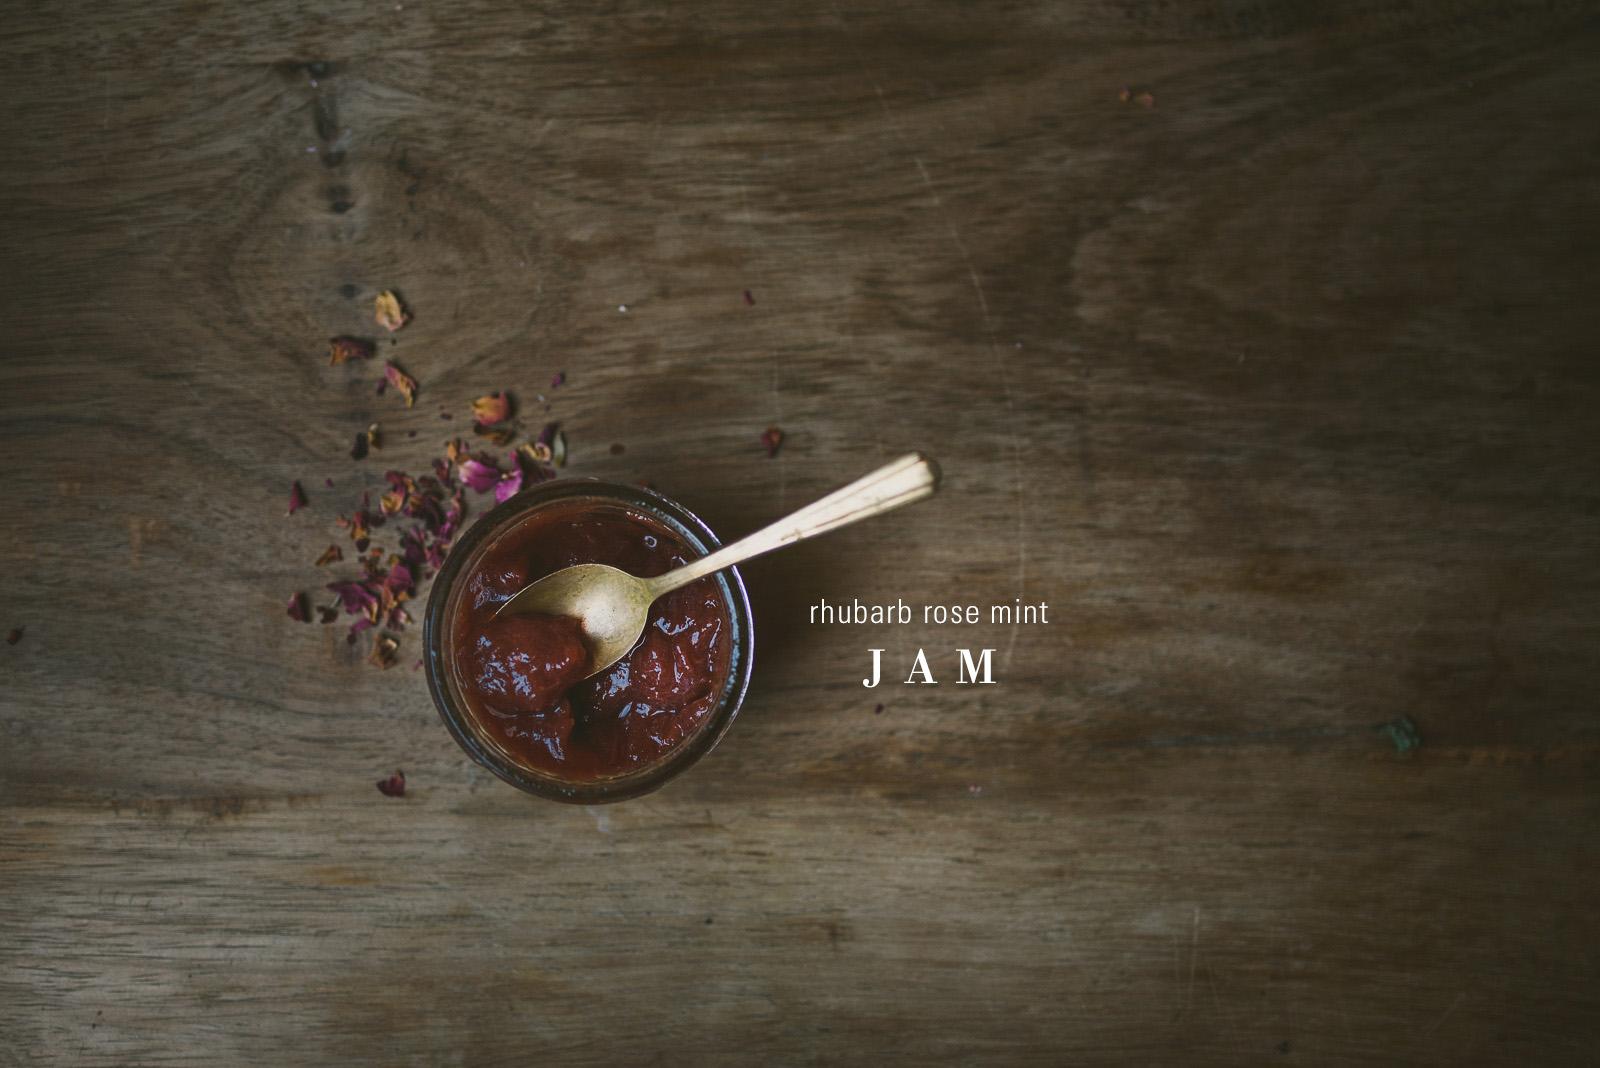 rhubarb-rose-mint-jam | le jus d